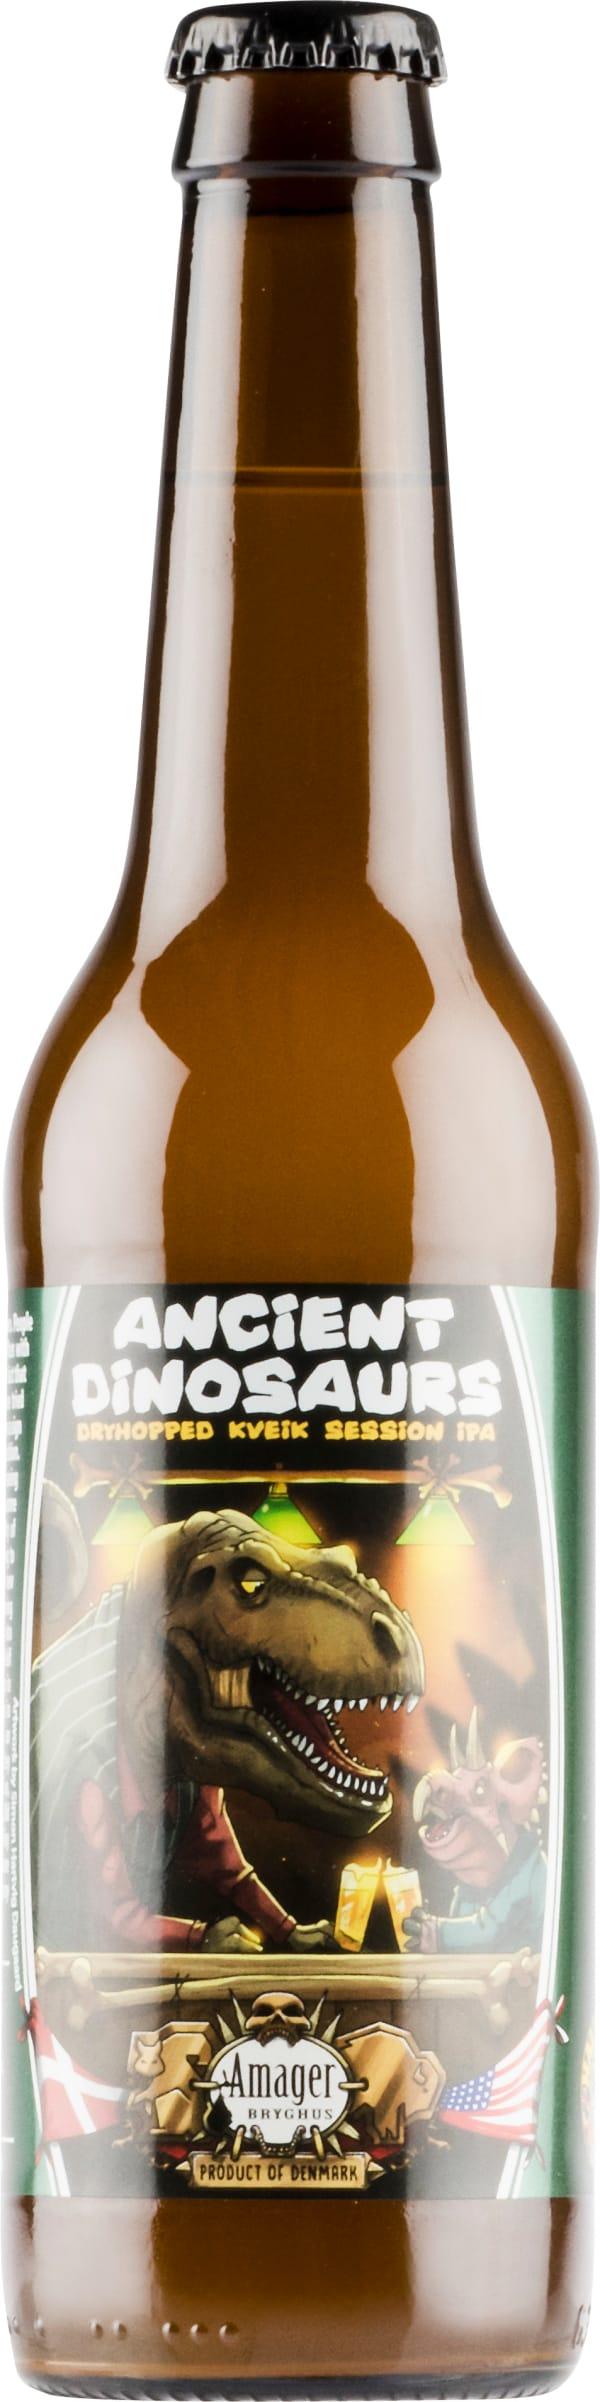 Amager Ancient Dinosaurs Kveik Session IPA